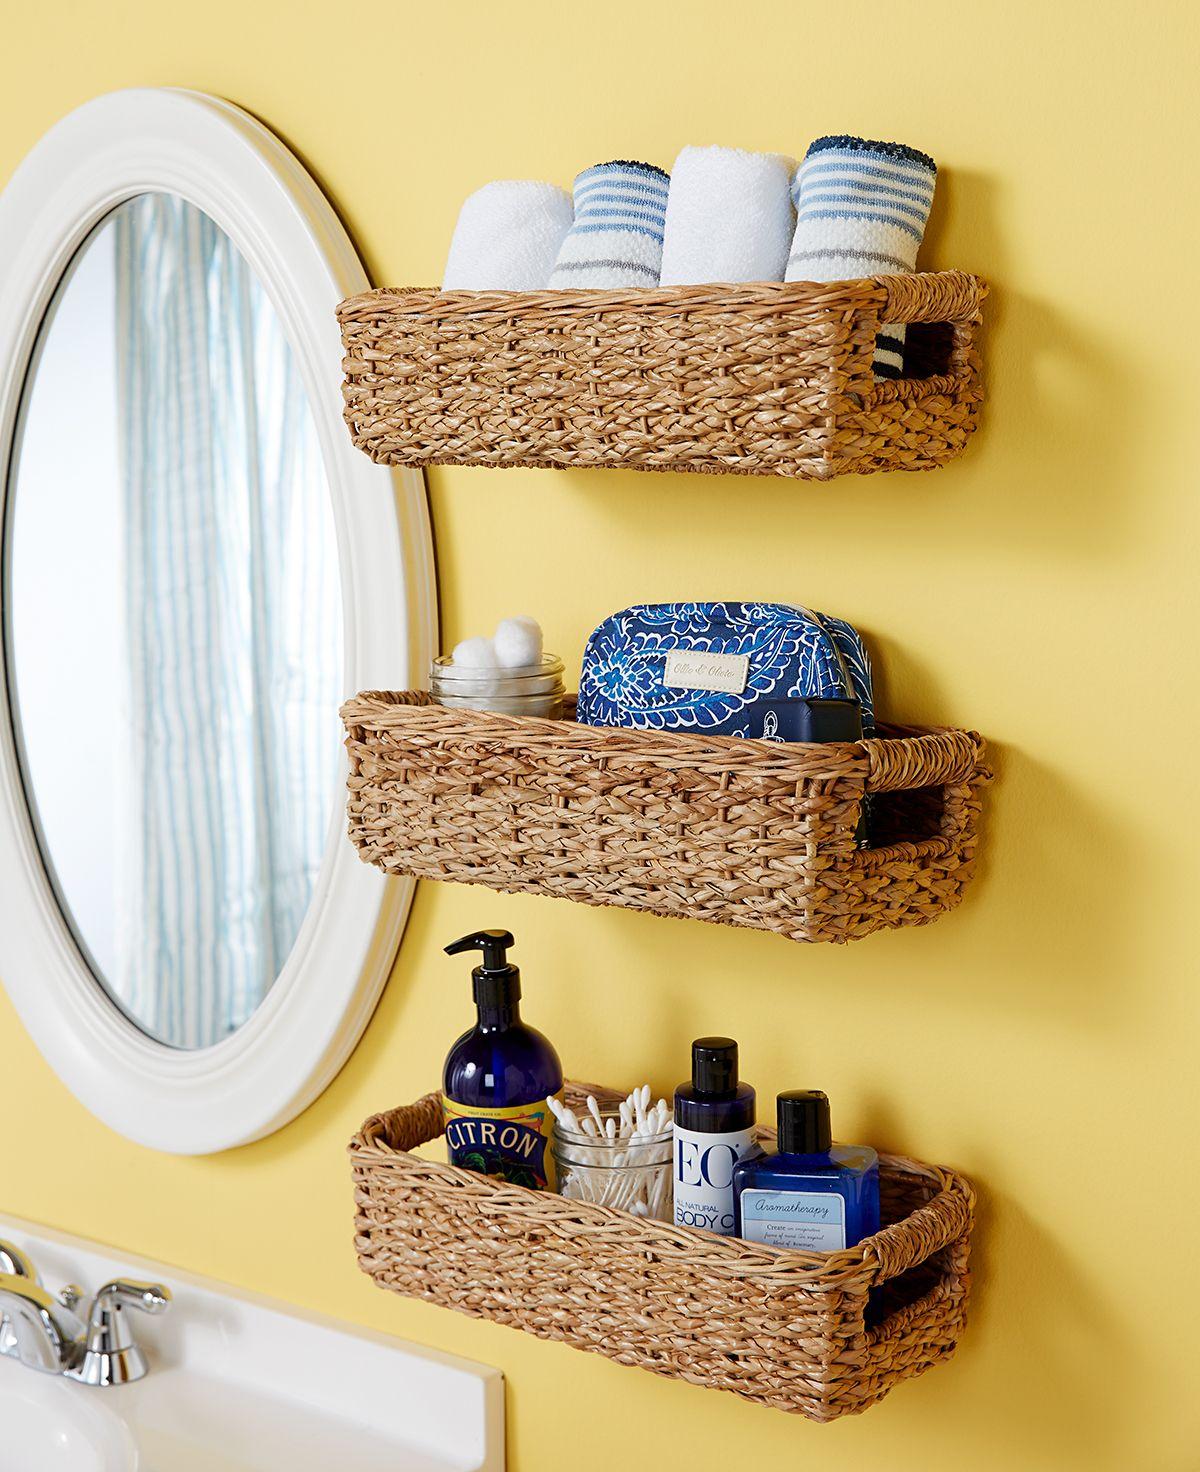 28 Towel Display Ideas For Pretty And Practical Bathroom Storage In 2020 Bathroom Basket Storage Diy Bathroom Storage Small Bathroom Storage